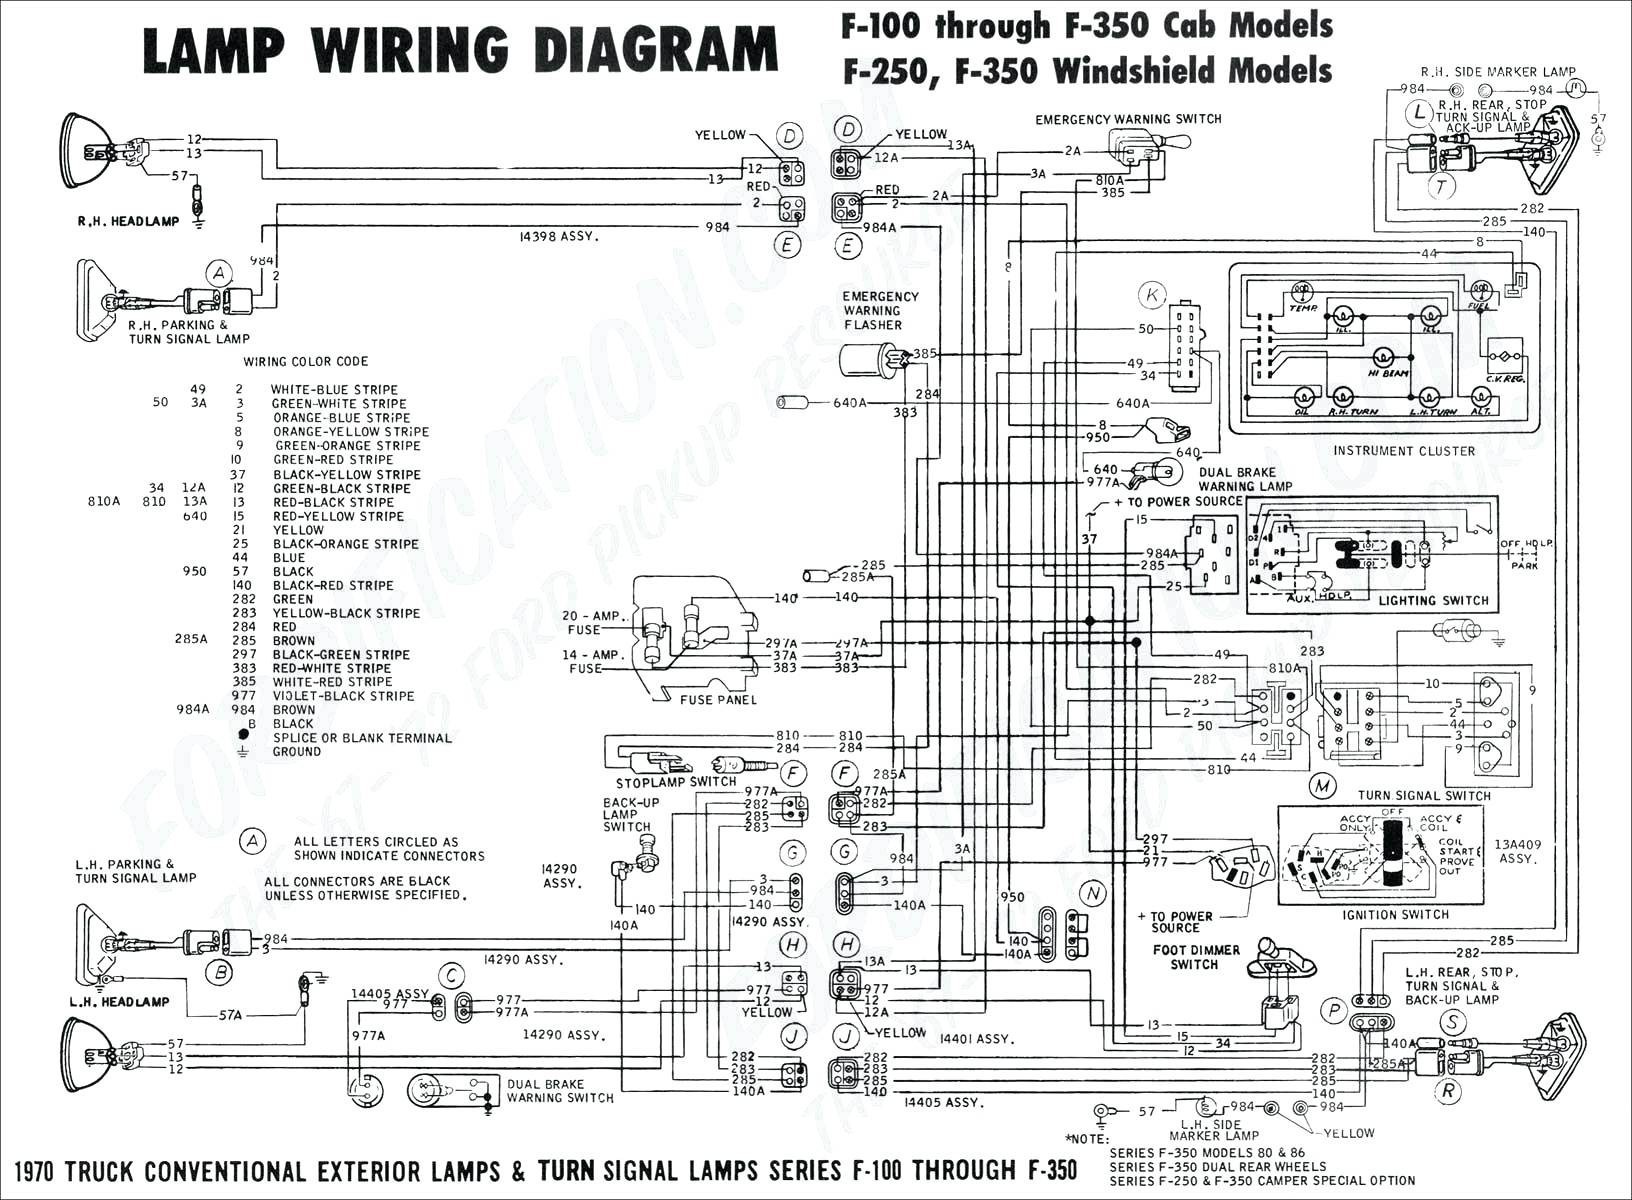 1998 Chevy Silverado Tail Light Wiring Diagram Chevy Silverado Wiring Diagram for 1997 Best Truck Radio Suburban Of 1998 Chevy Silverado Tail Light Wiring Diagram